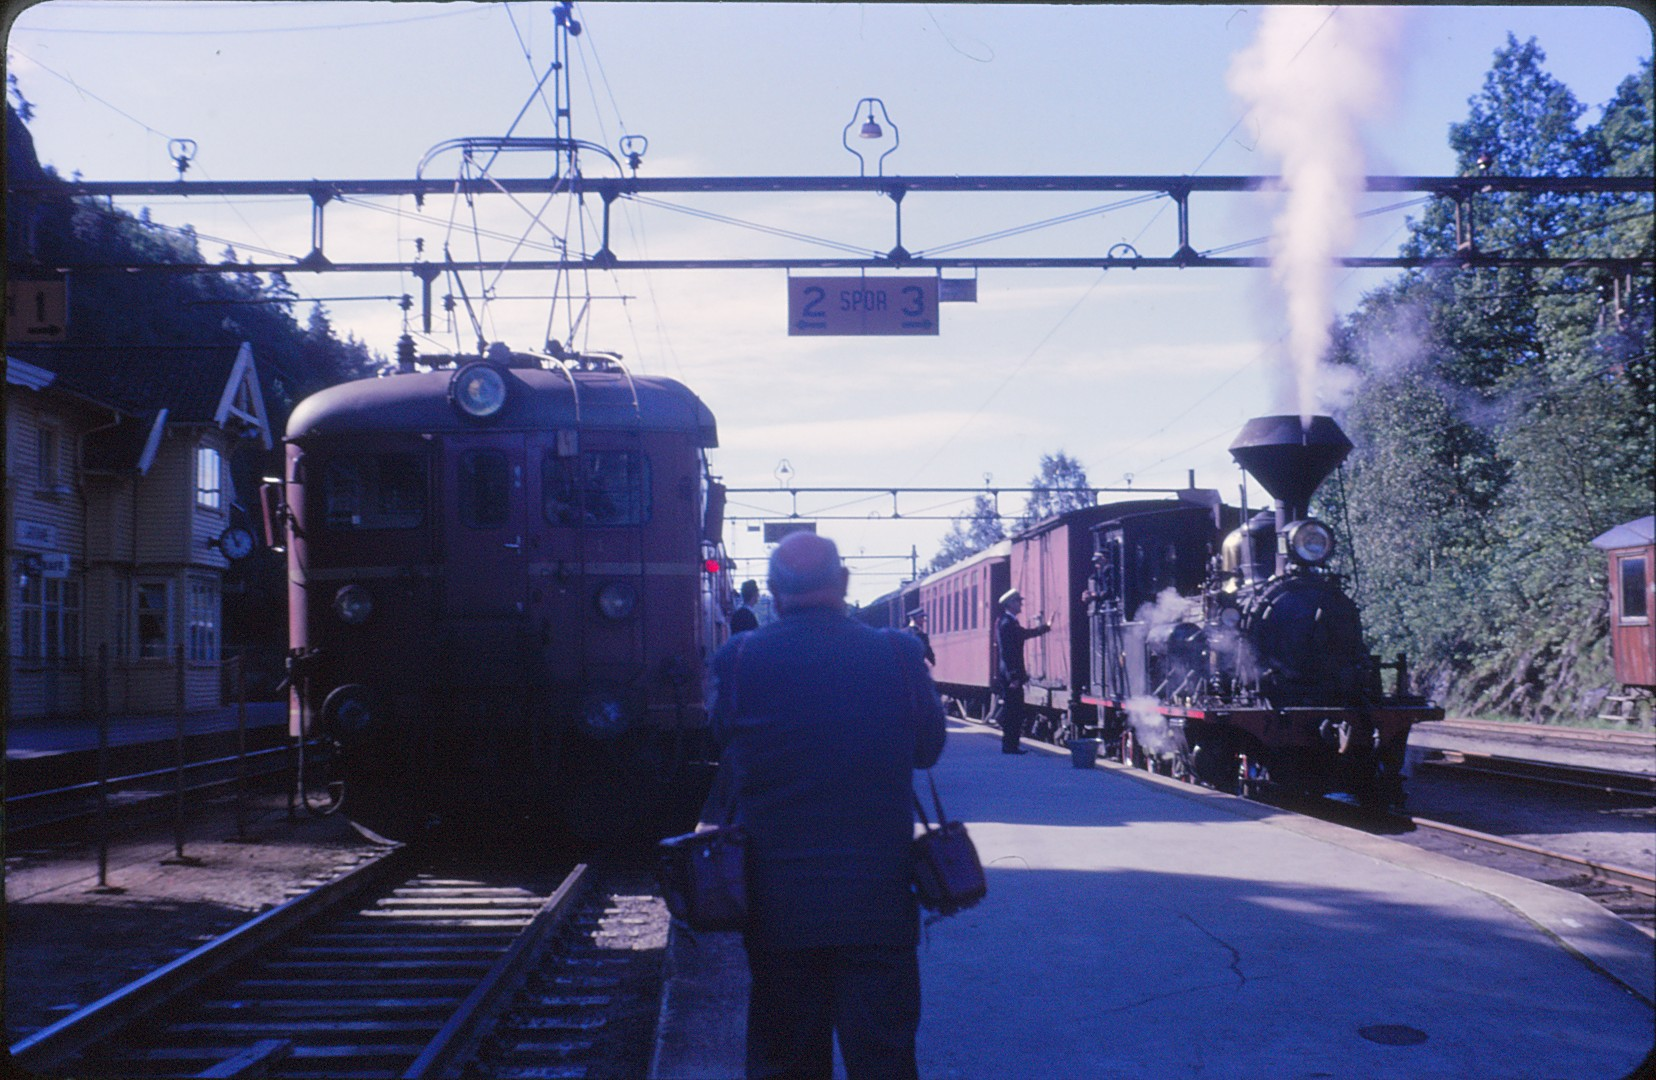 Setesdalsbanen_1962__nr__1_2305_0E3235_jpg